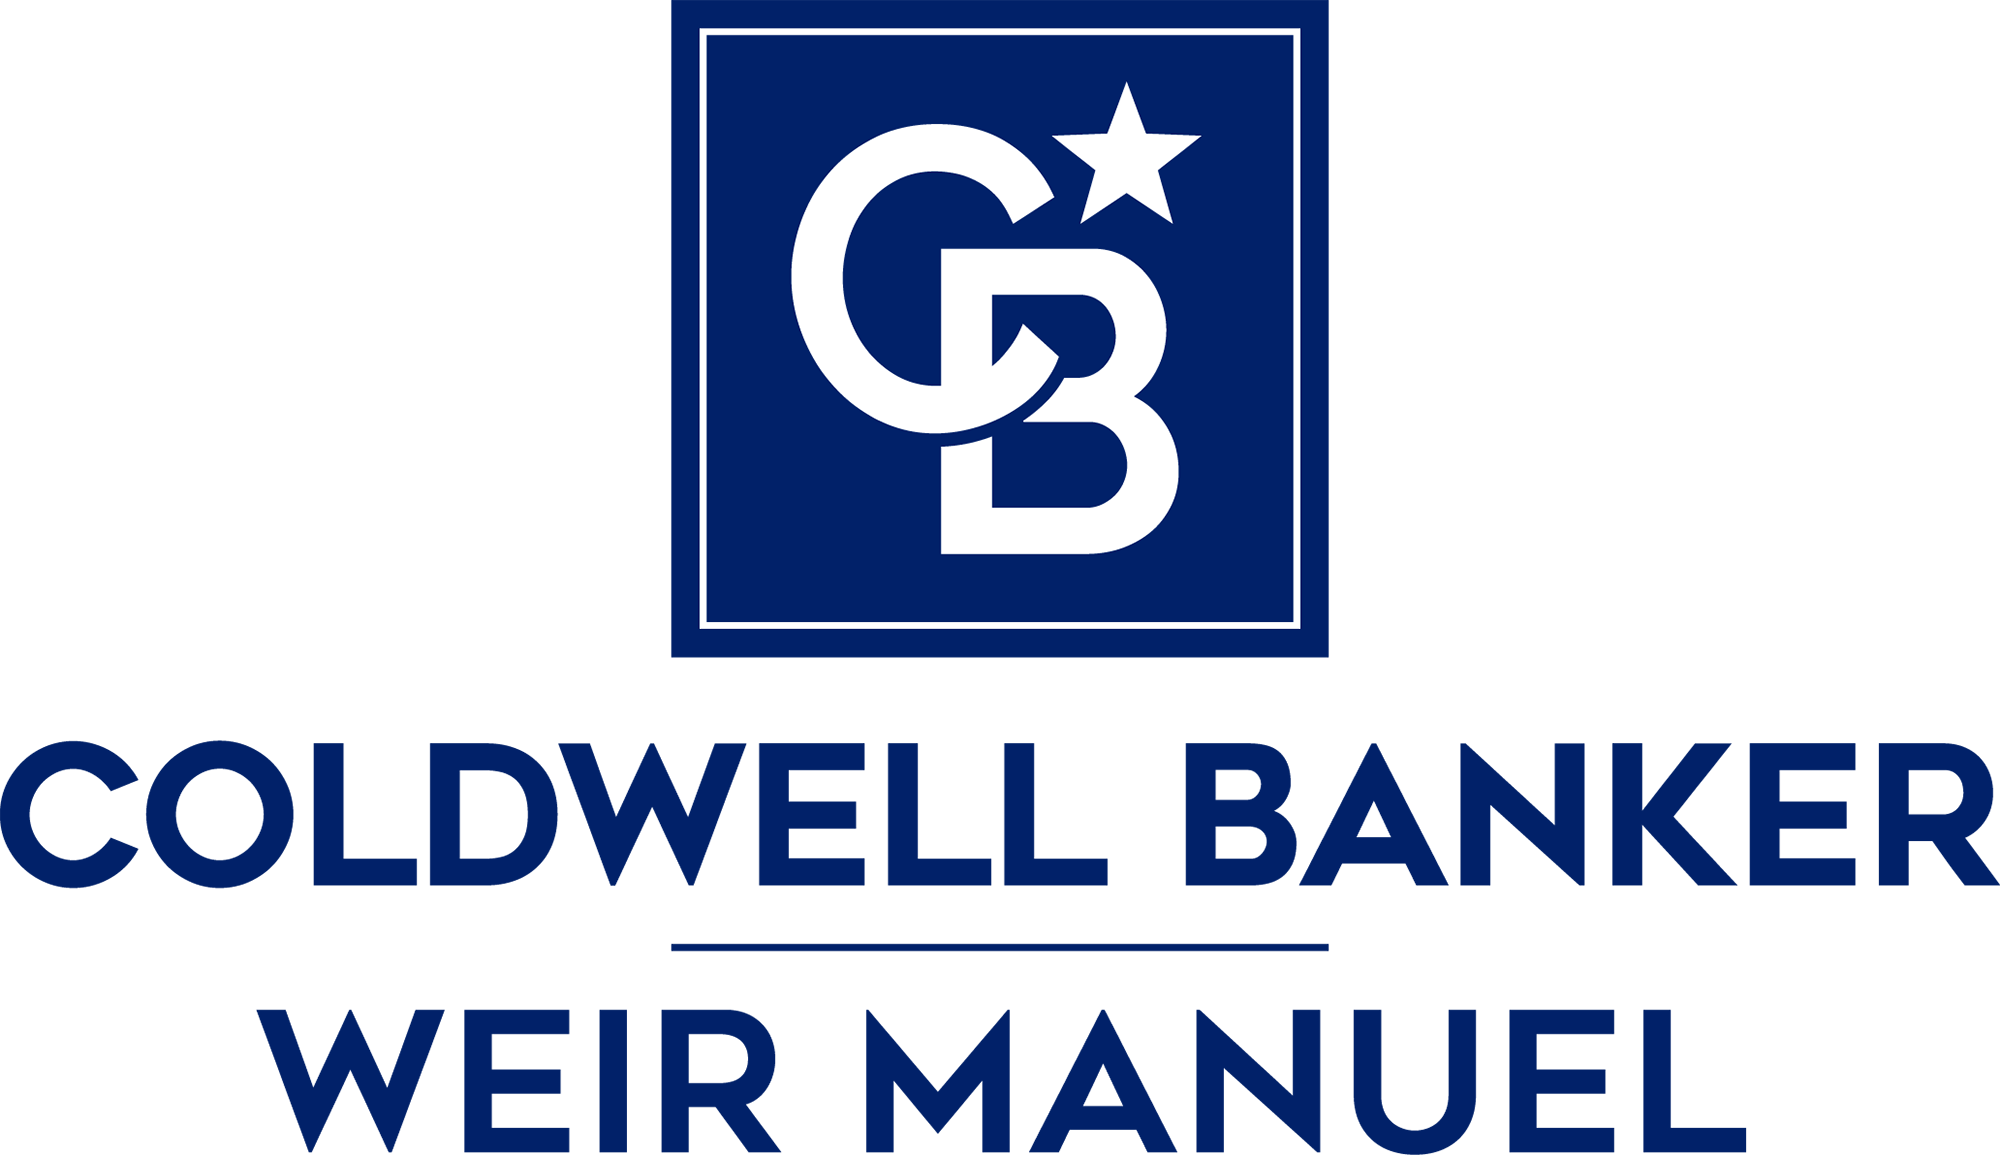 cbwm04 Logo